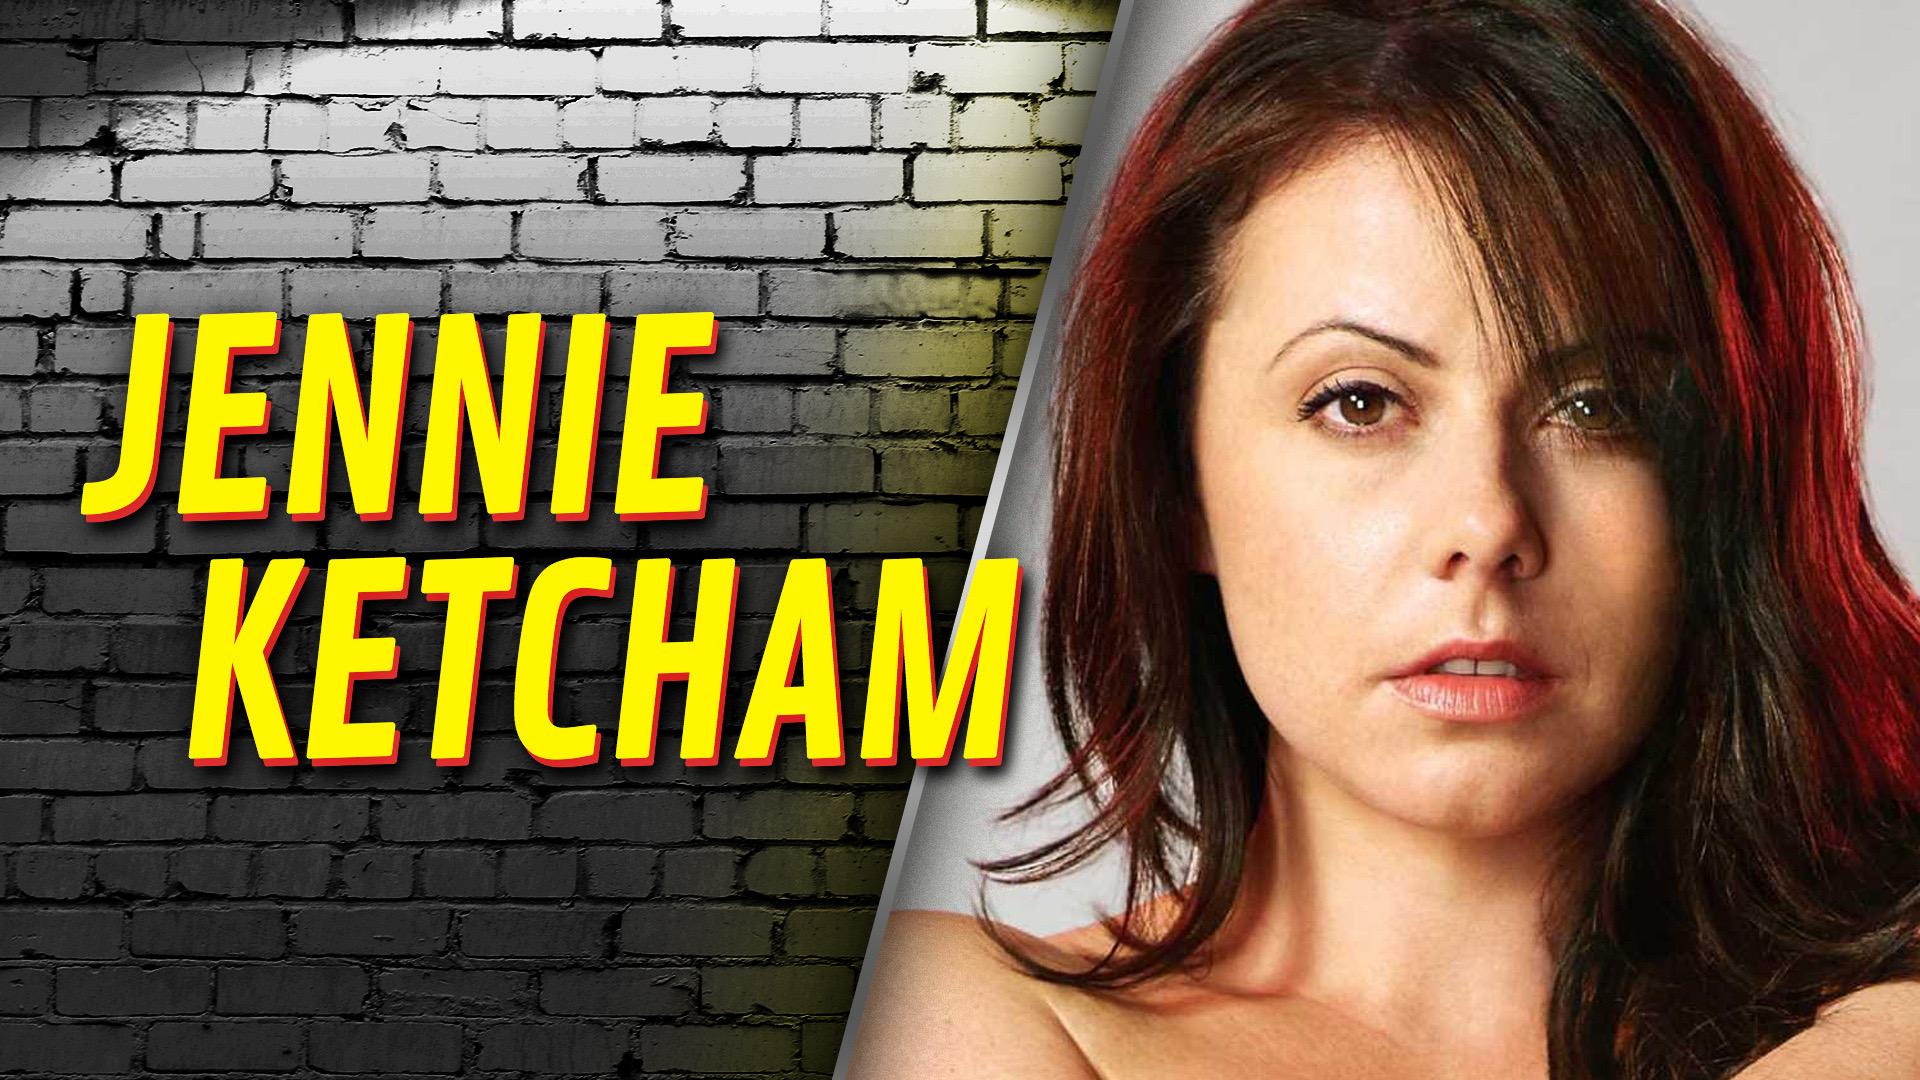 #YOULIVE 167 -Celeb Rehab's Jennie Ketcham